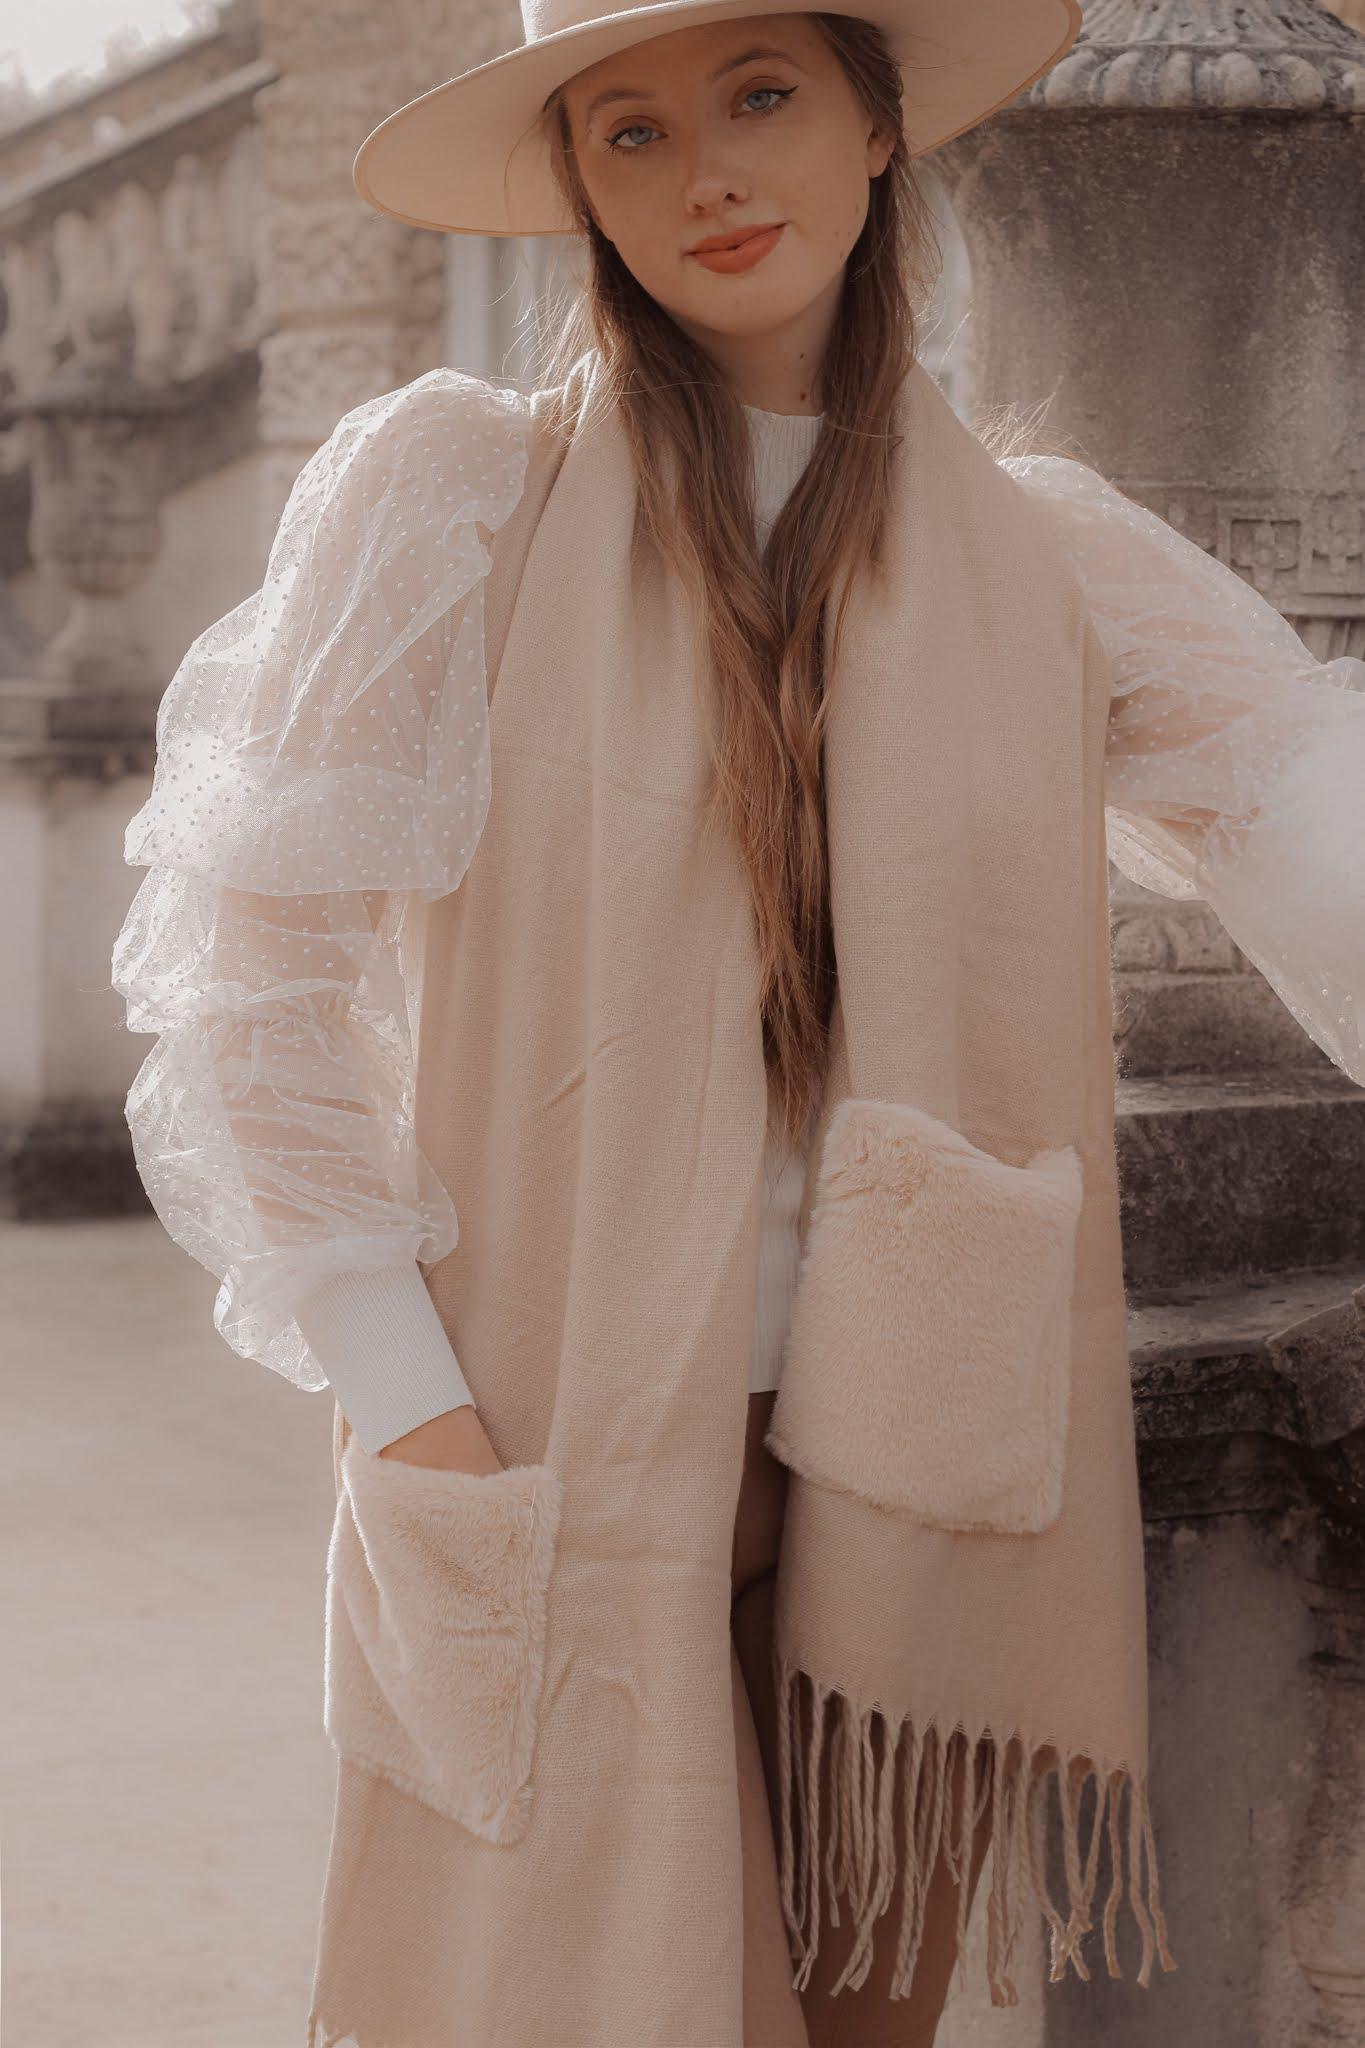 London women's luxury fashion blogger